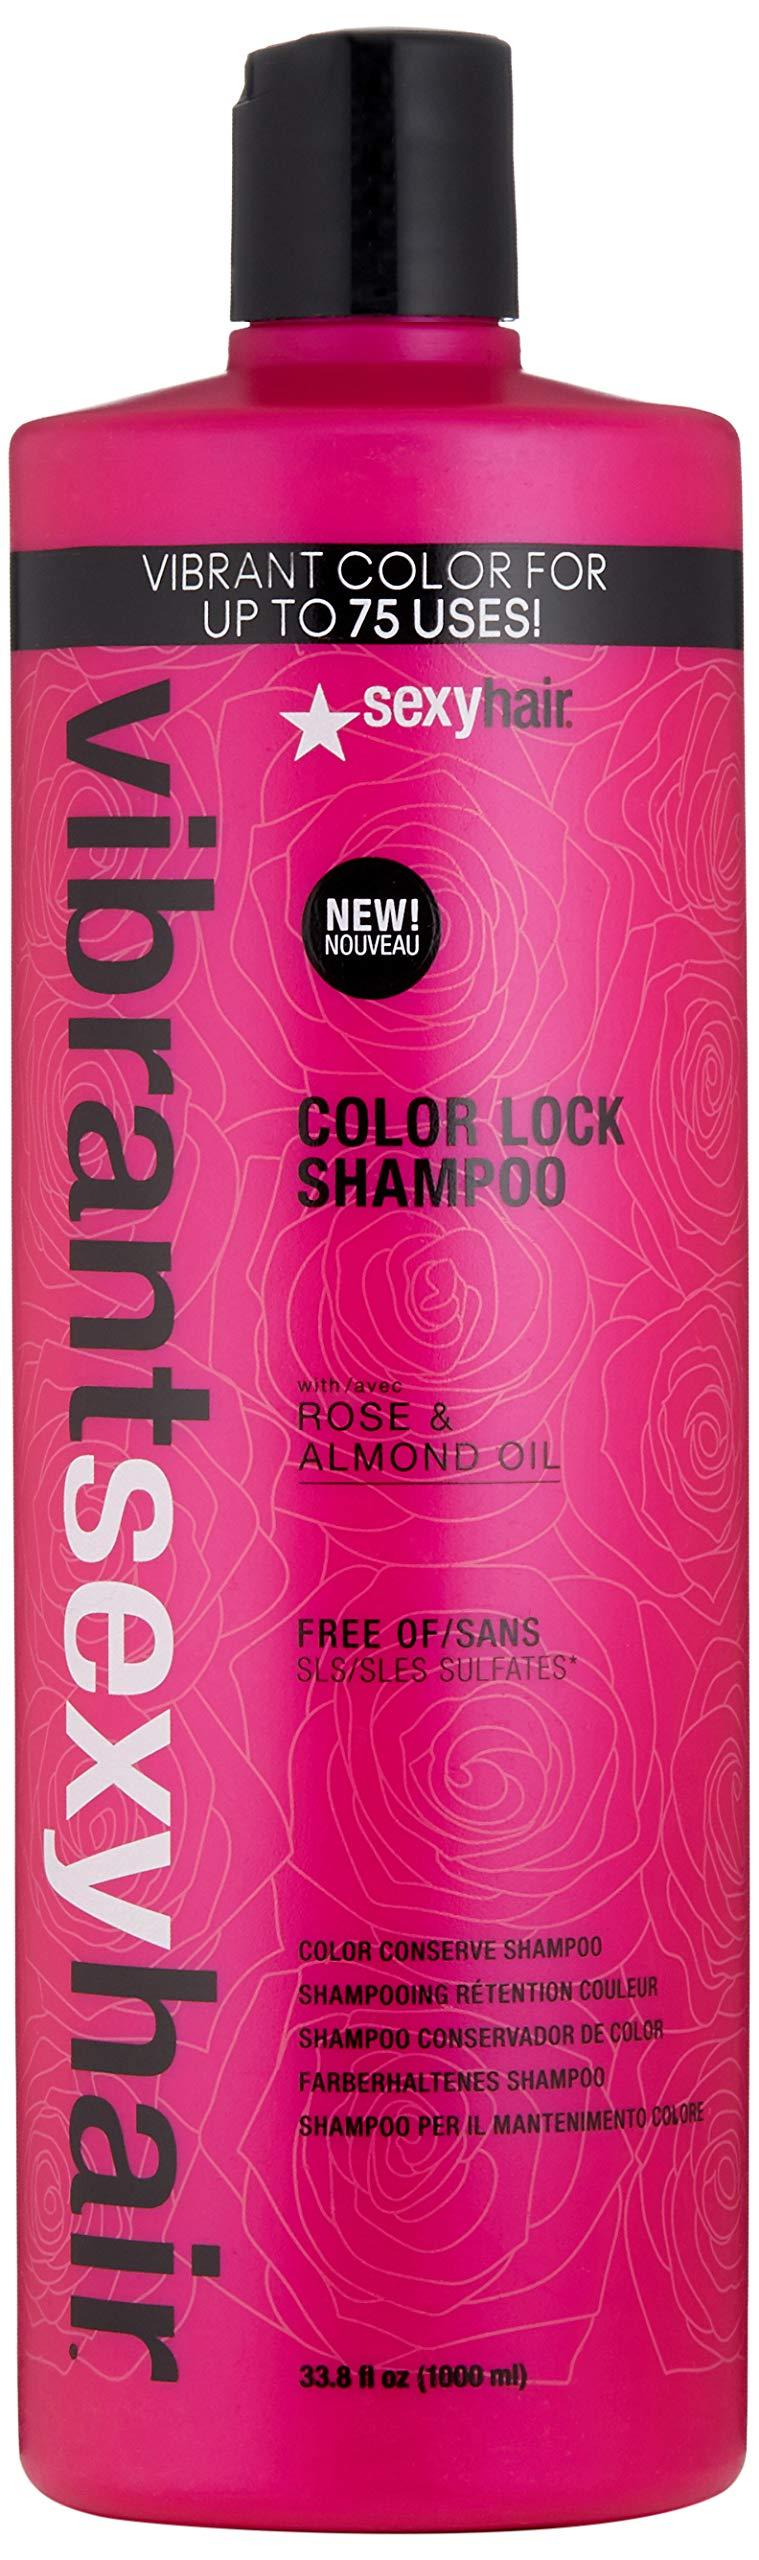 SEXYHAIR Vibrant Color Lock Shampoo, 33.8 fl. oz. by SEXYHAIR